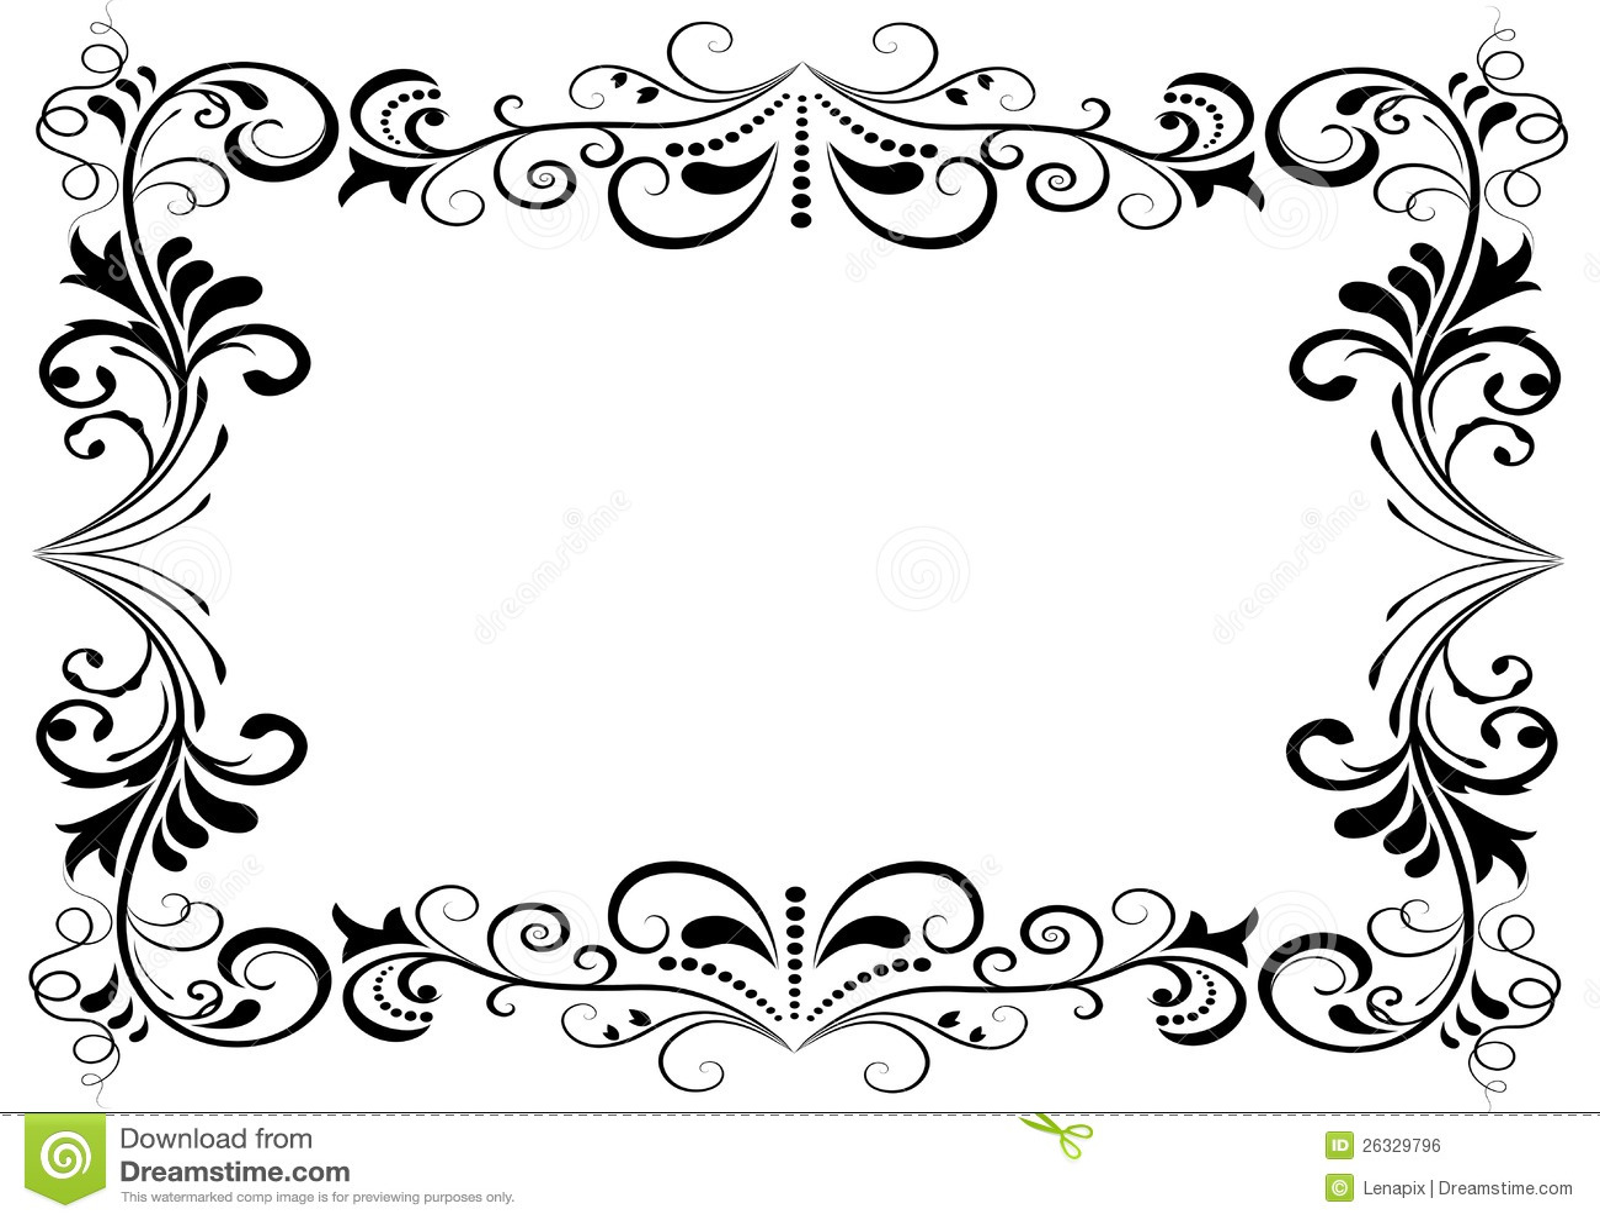 Black And White Floral Frame Stock Vector - Illustration of black ...